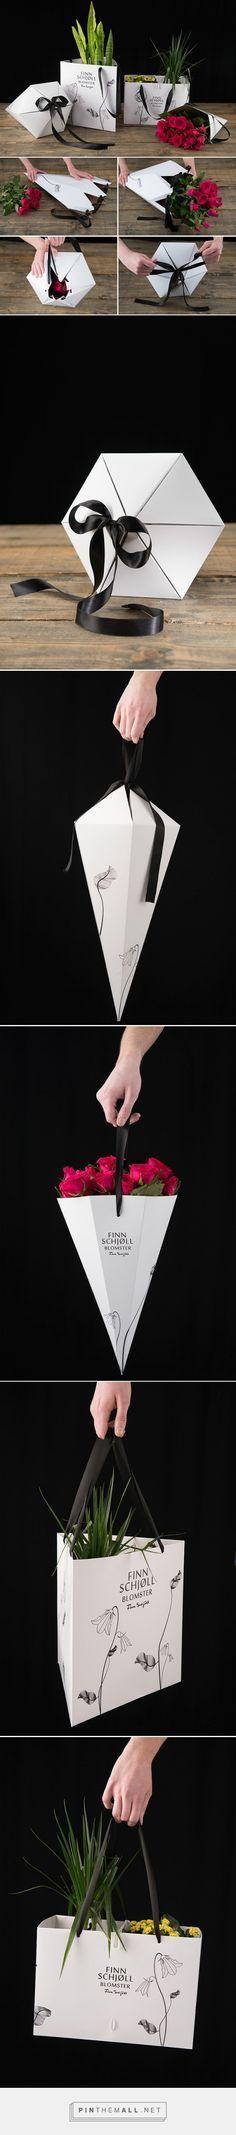 Flower packaging from http://www.packageinspiration.com/flower-packaging.html/